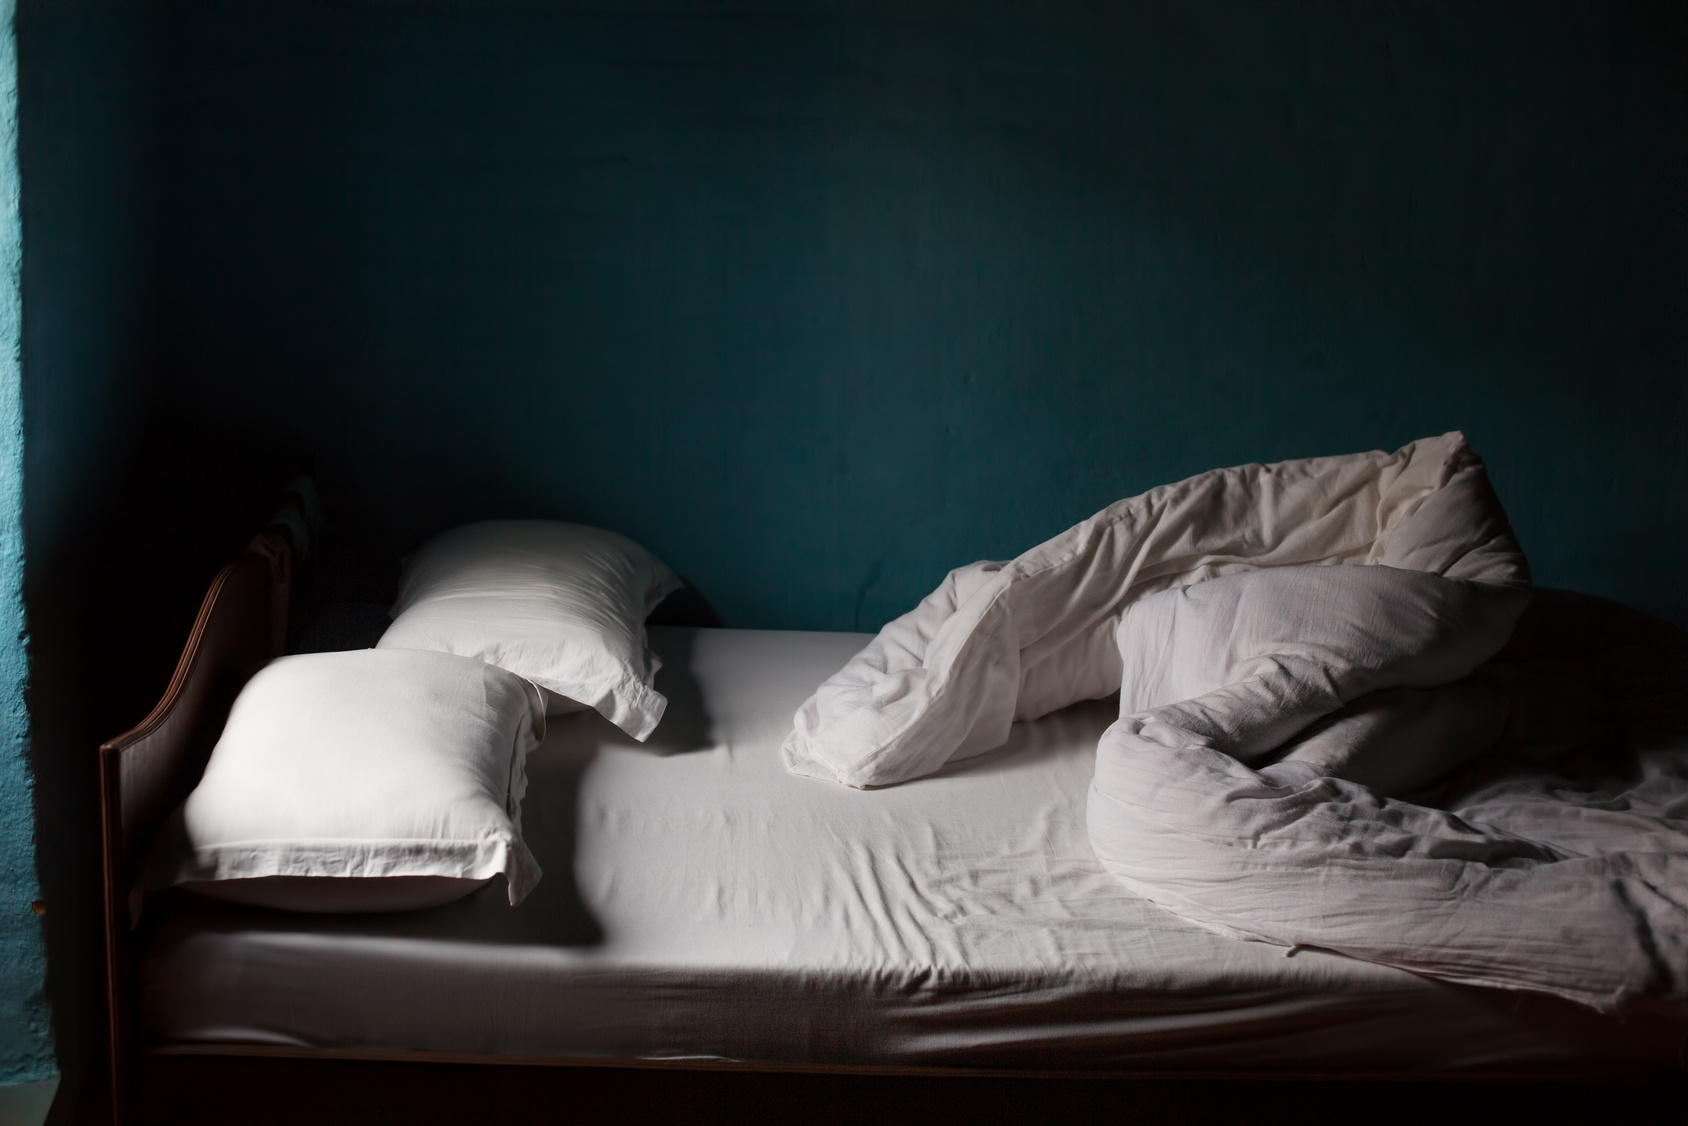 Verlassenes Bett bei Nacht